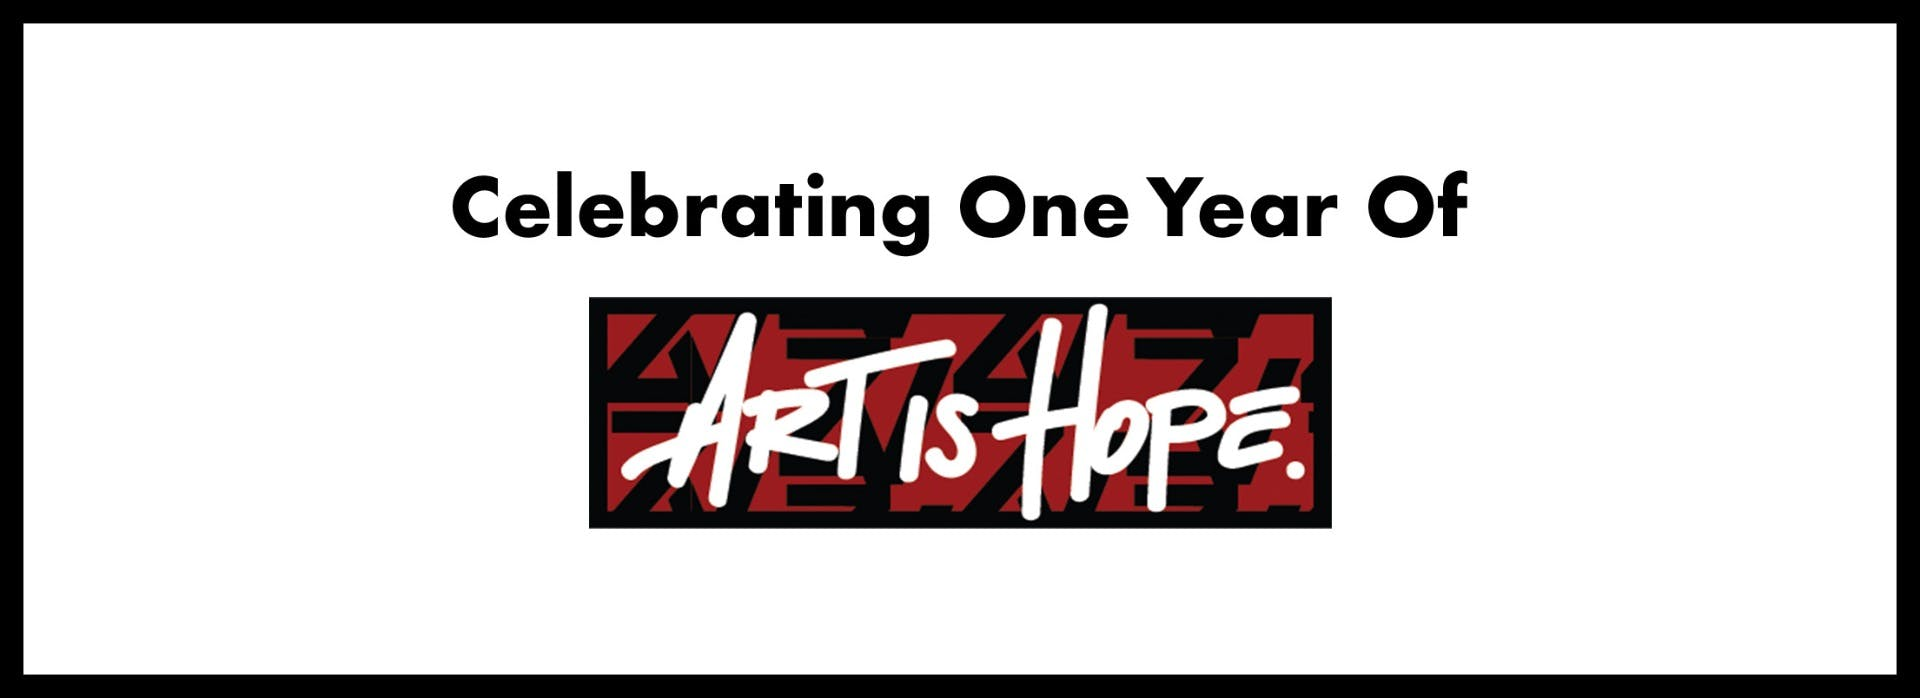 Art is hope banner image displaying the artist Daphne Arthur